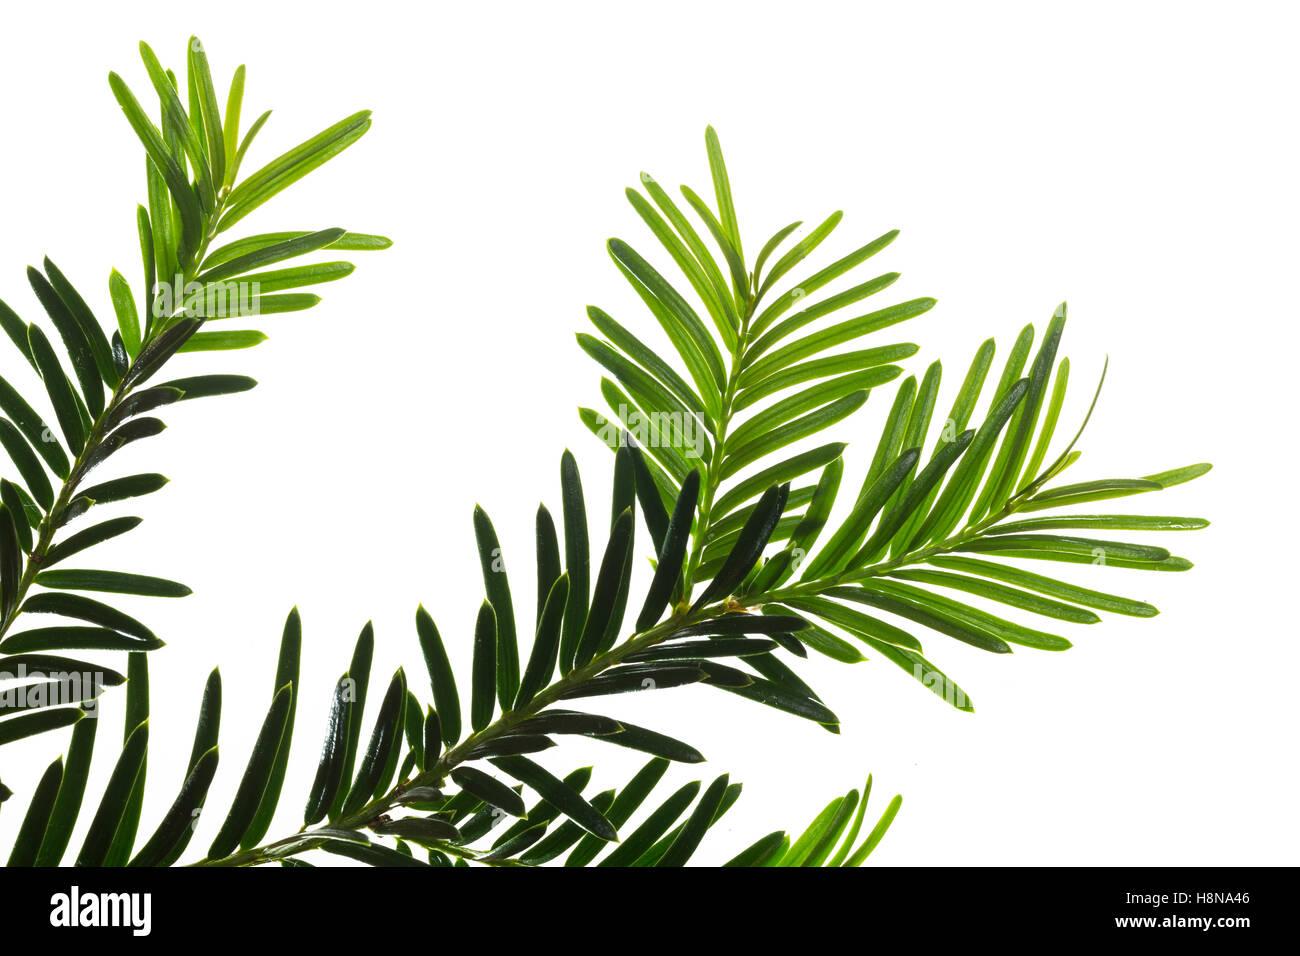 Europäische Eibe, Eibenbaum, Taxus baccata, European yew, Common yew, yew, L'If commun, If - Stock Image